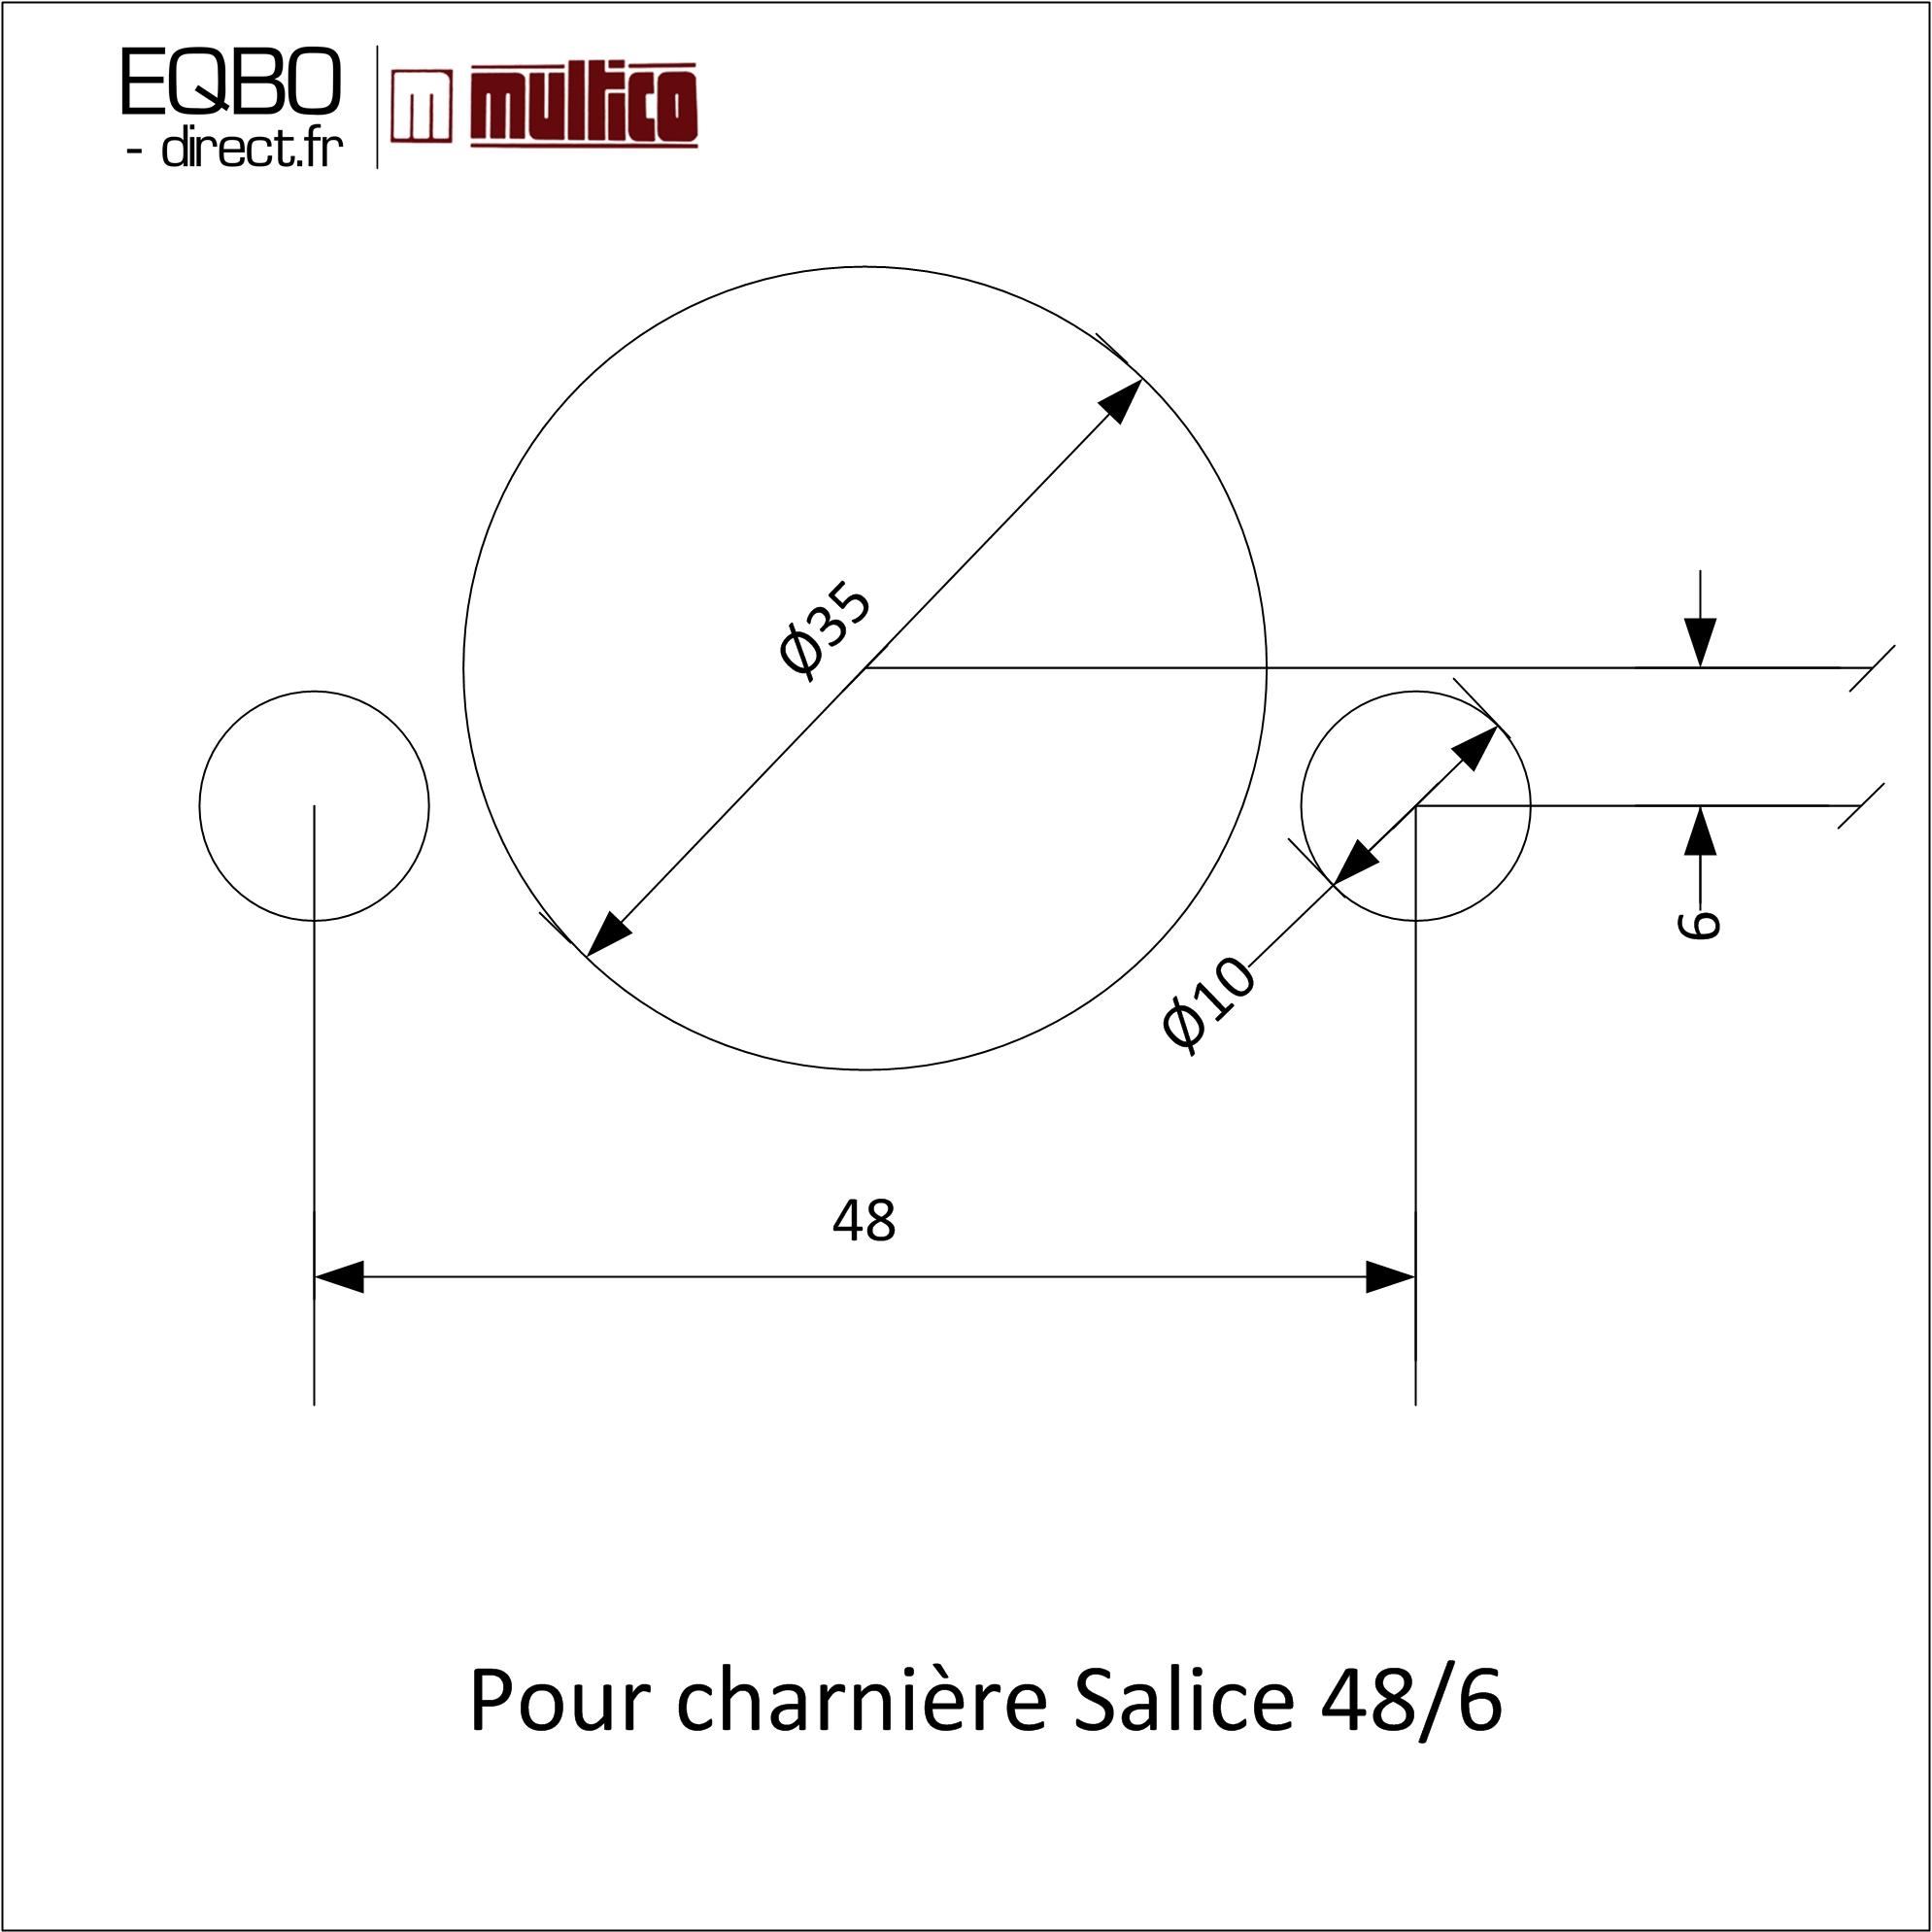 charniere Salice